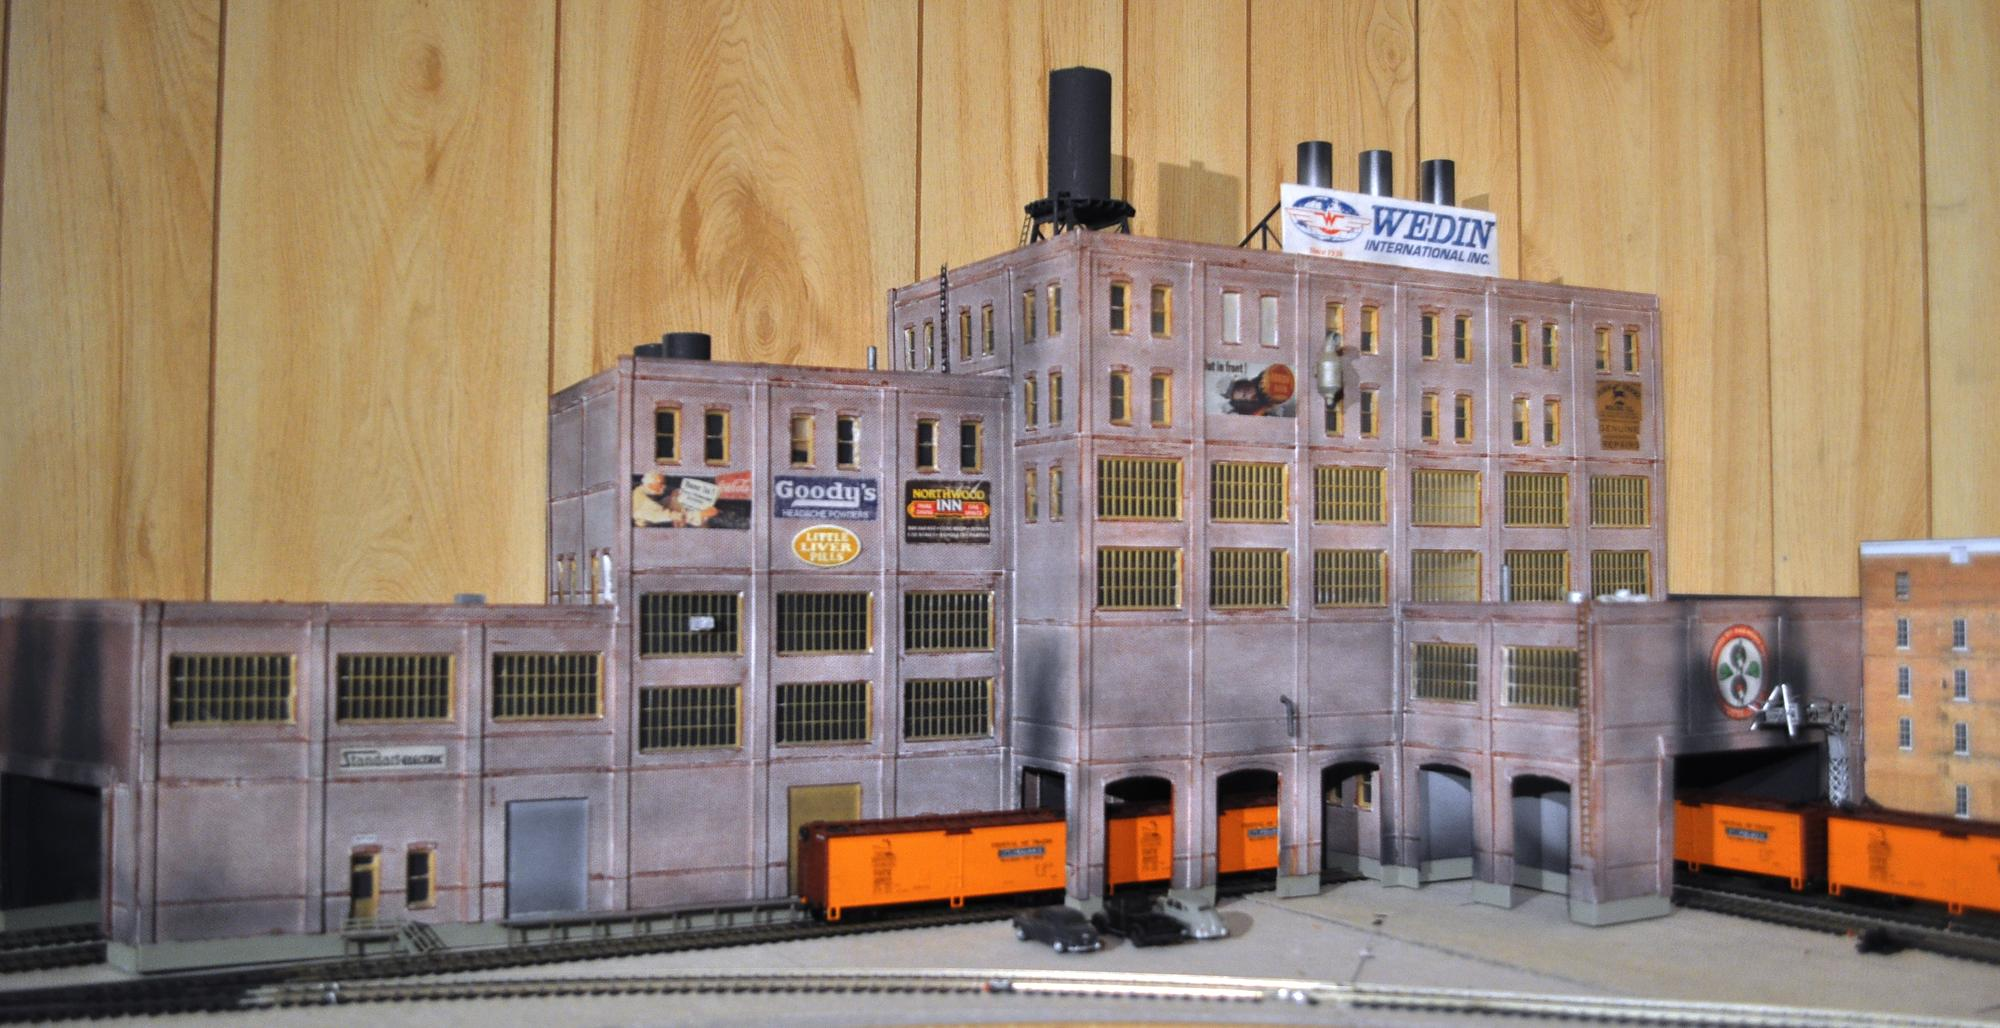 Model Train Guide: More Model railroad building signs